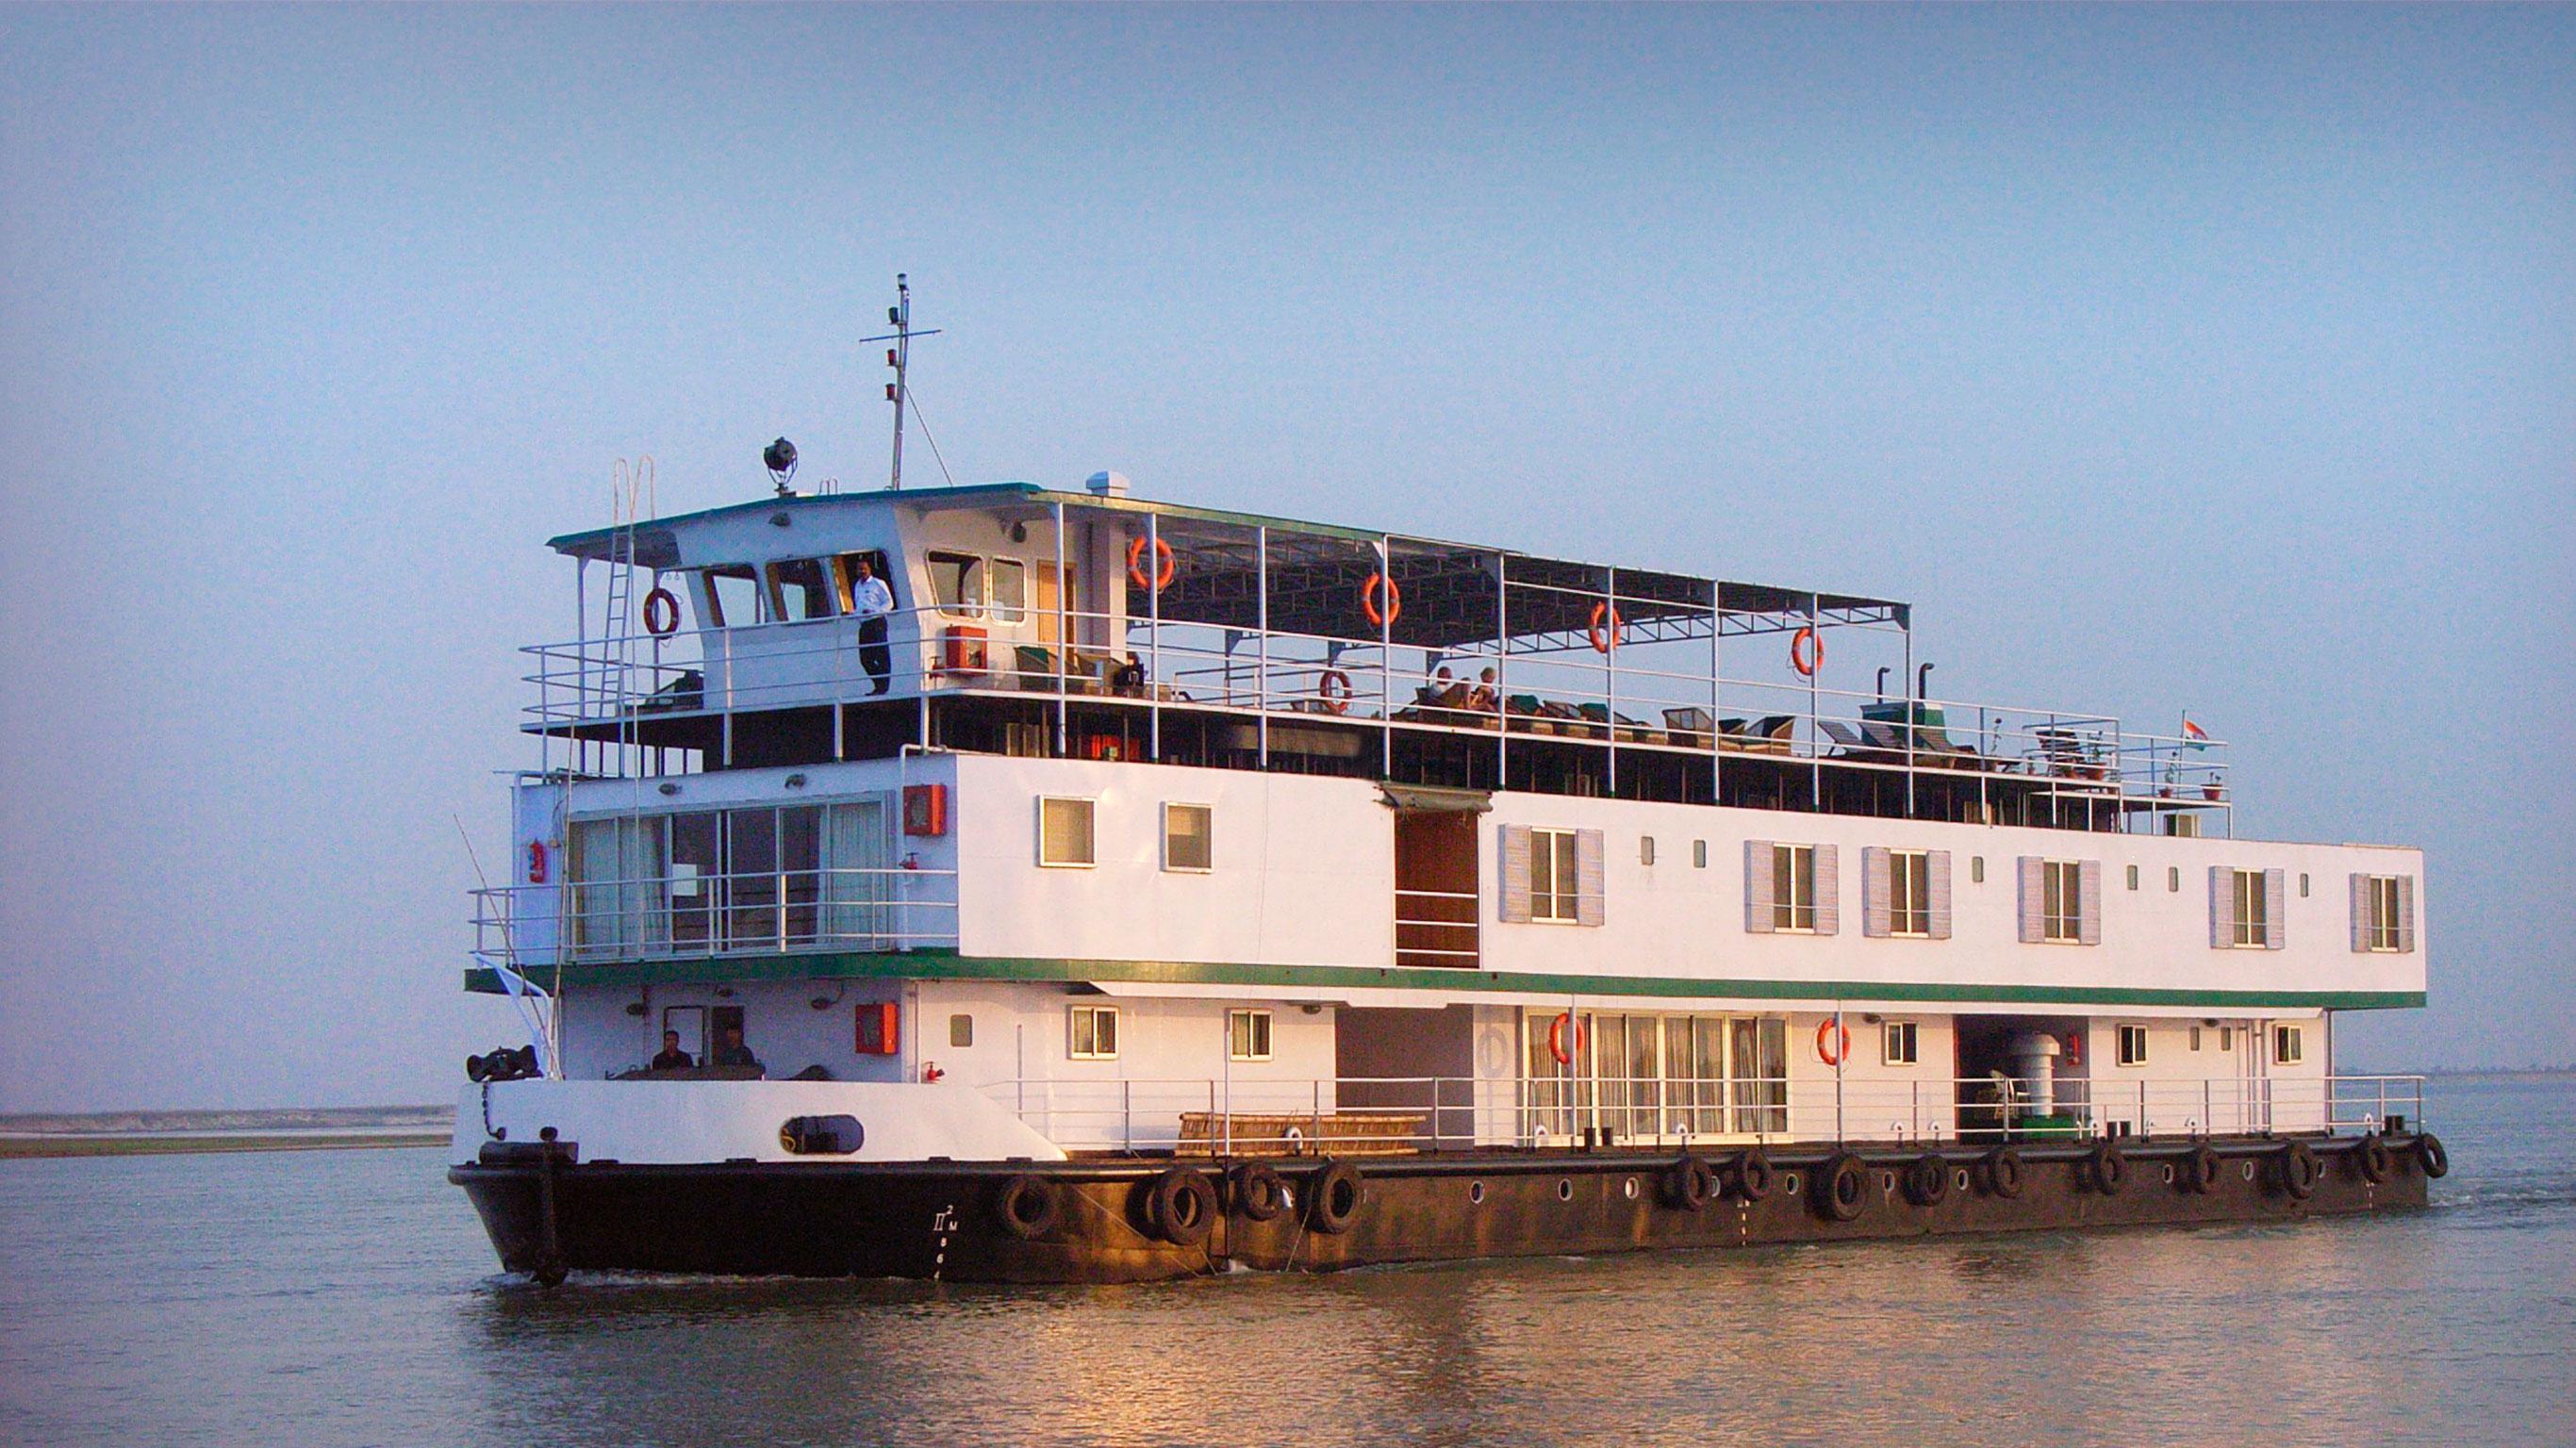 ganges-river-cruise-encompassed